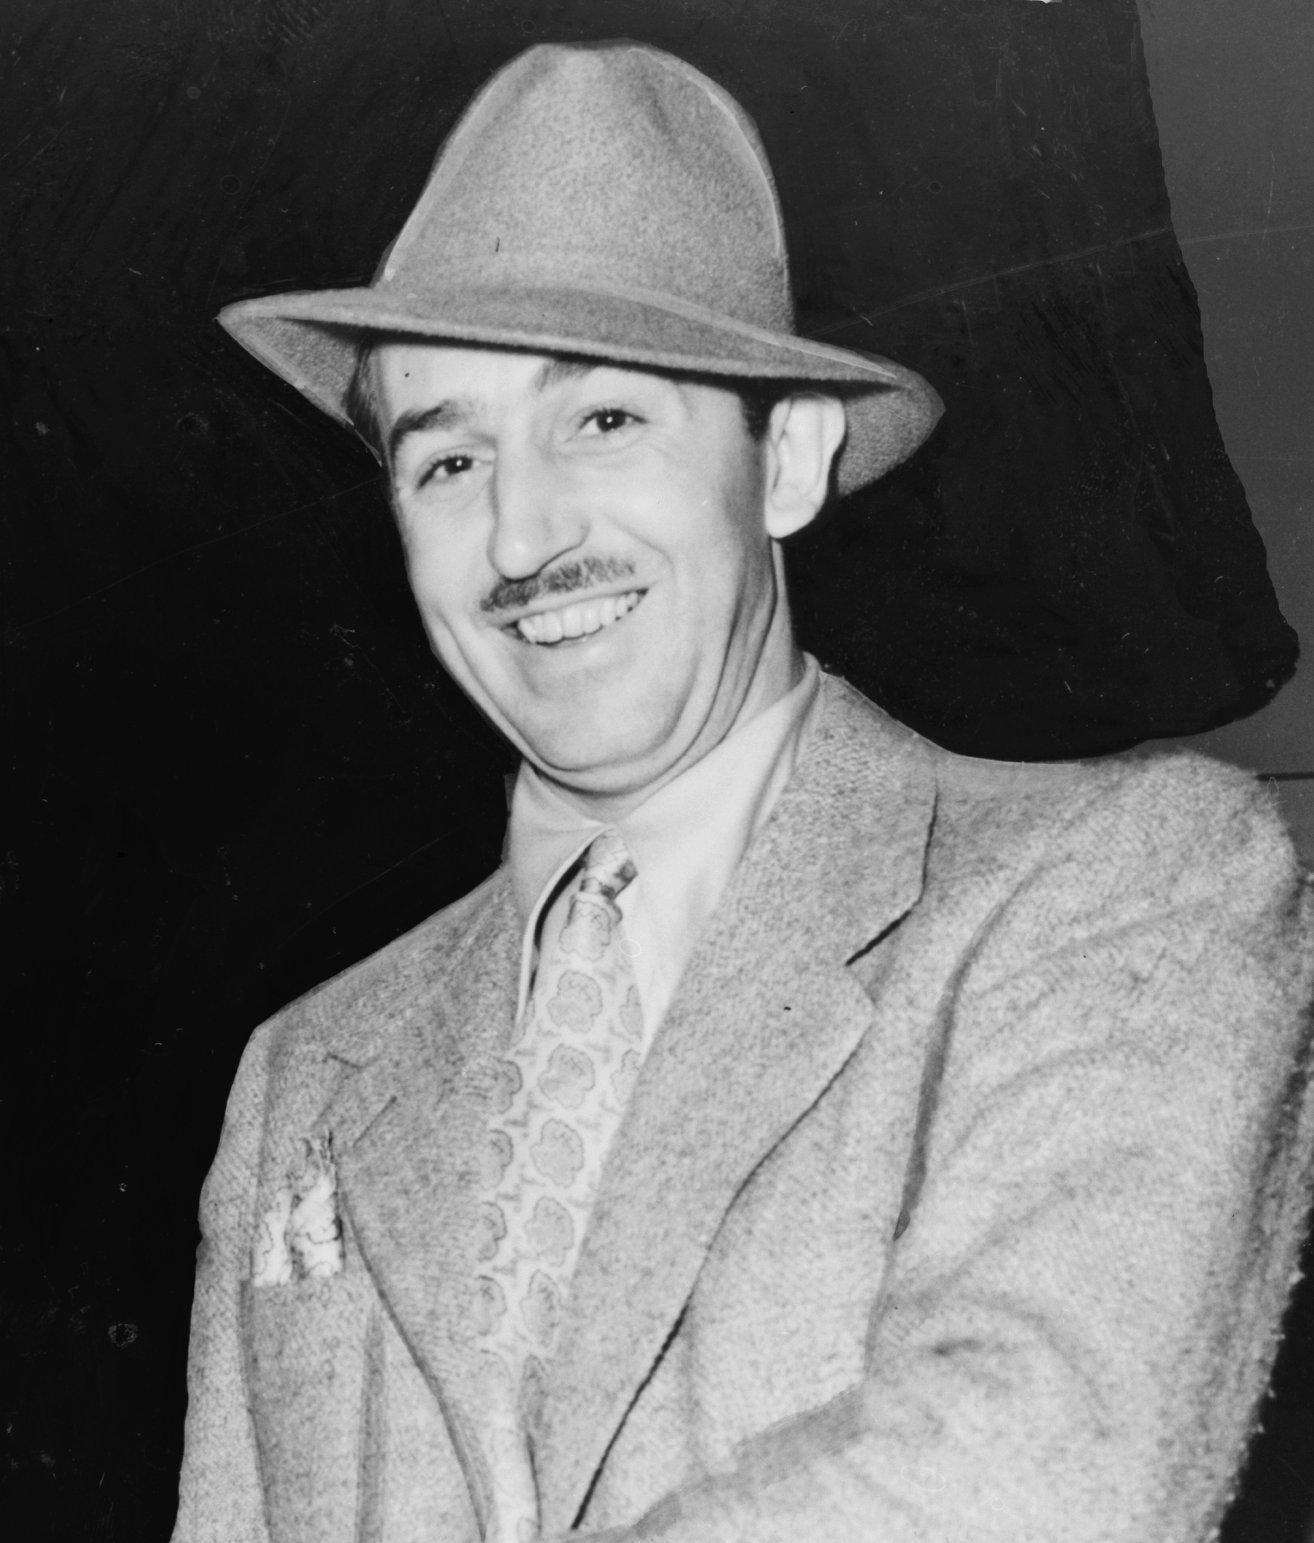 Walter Disney - Walt Disney Creator